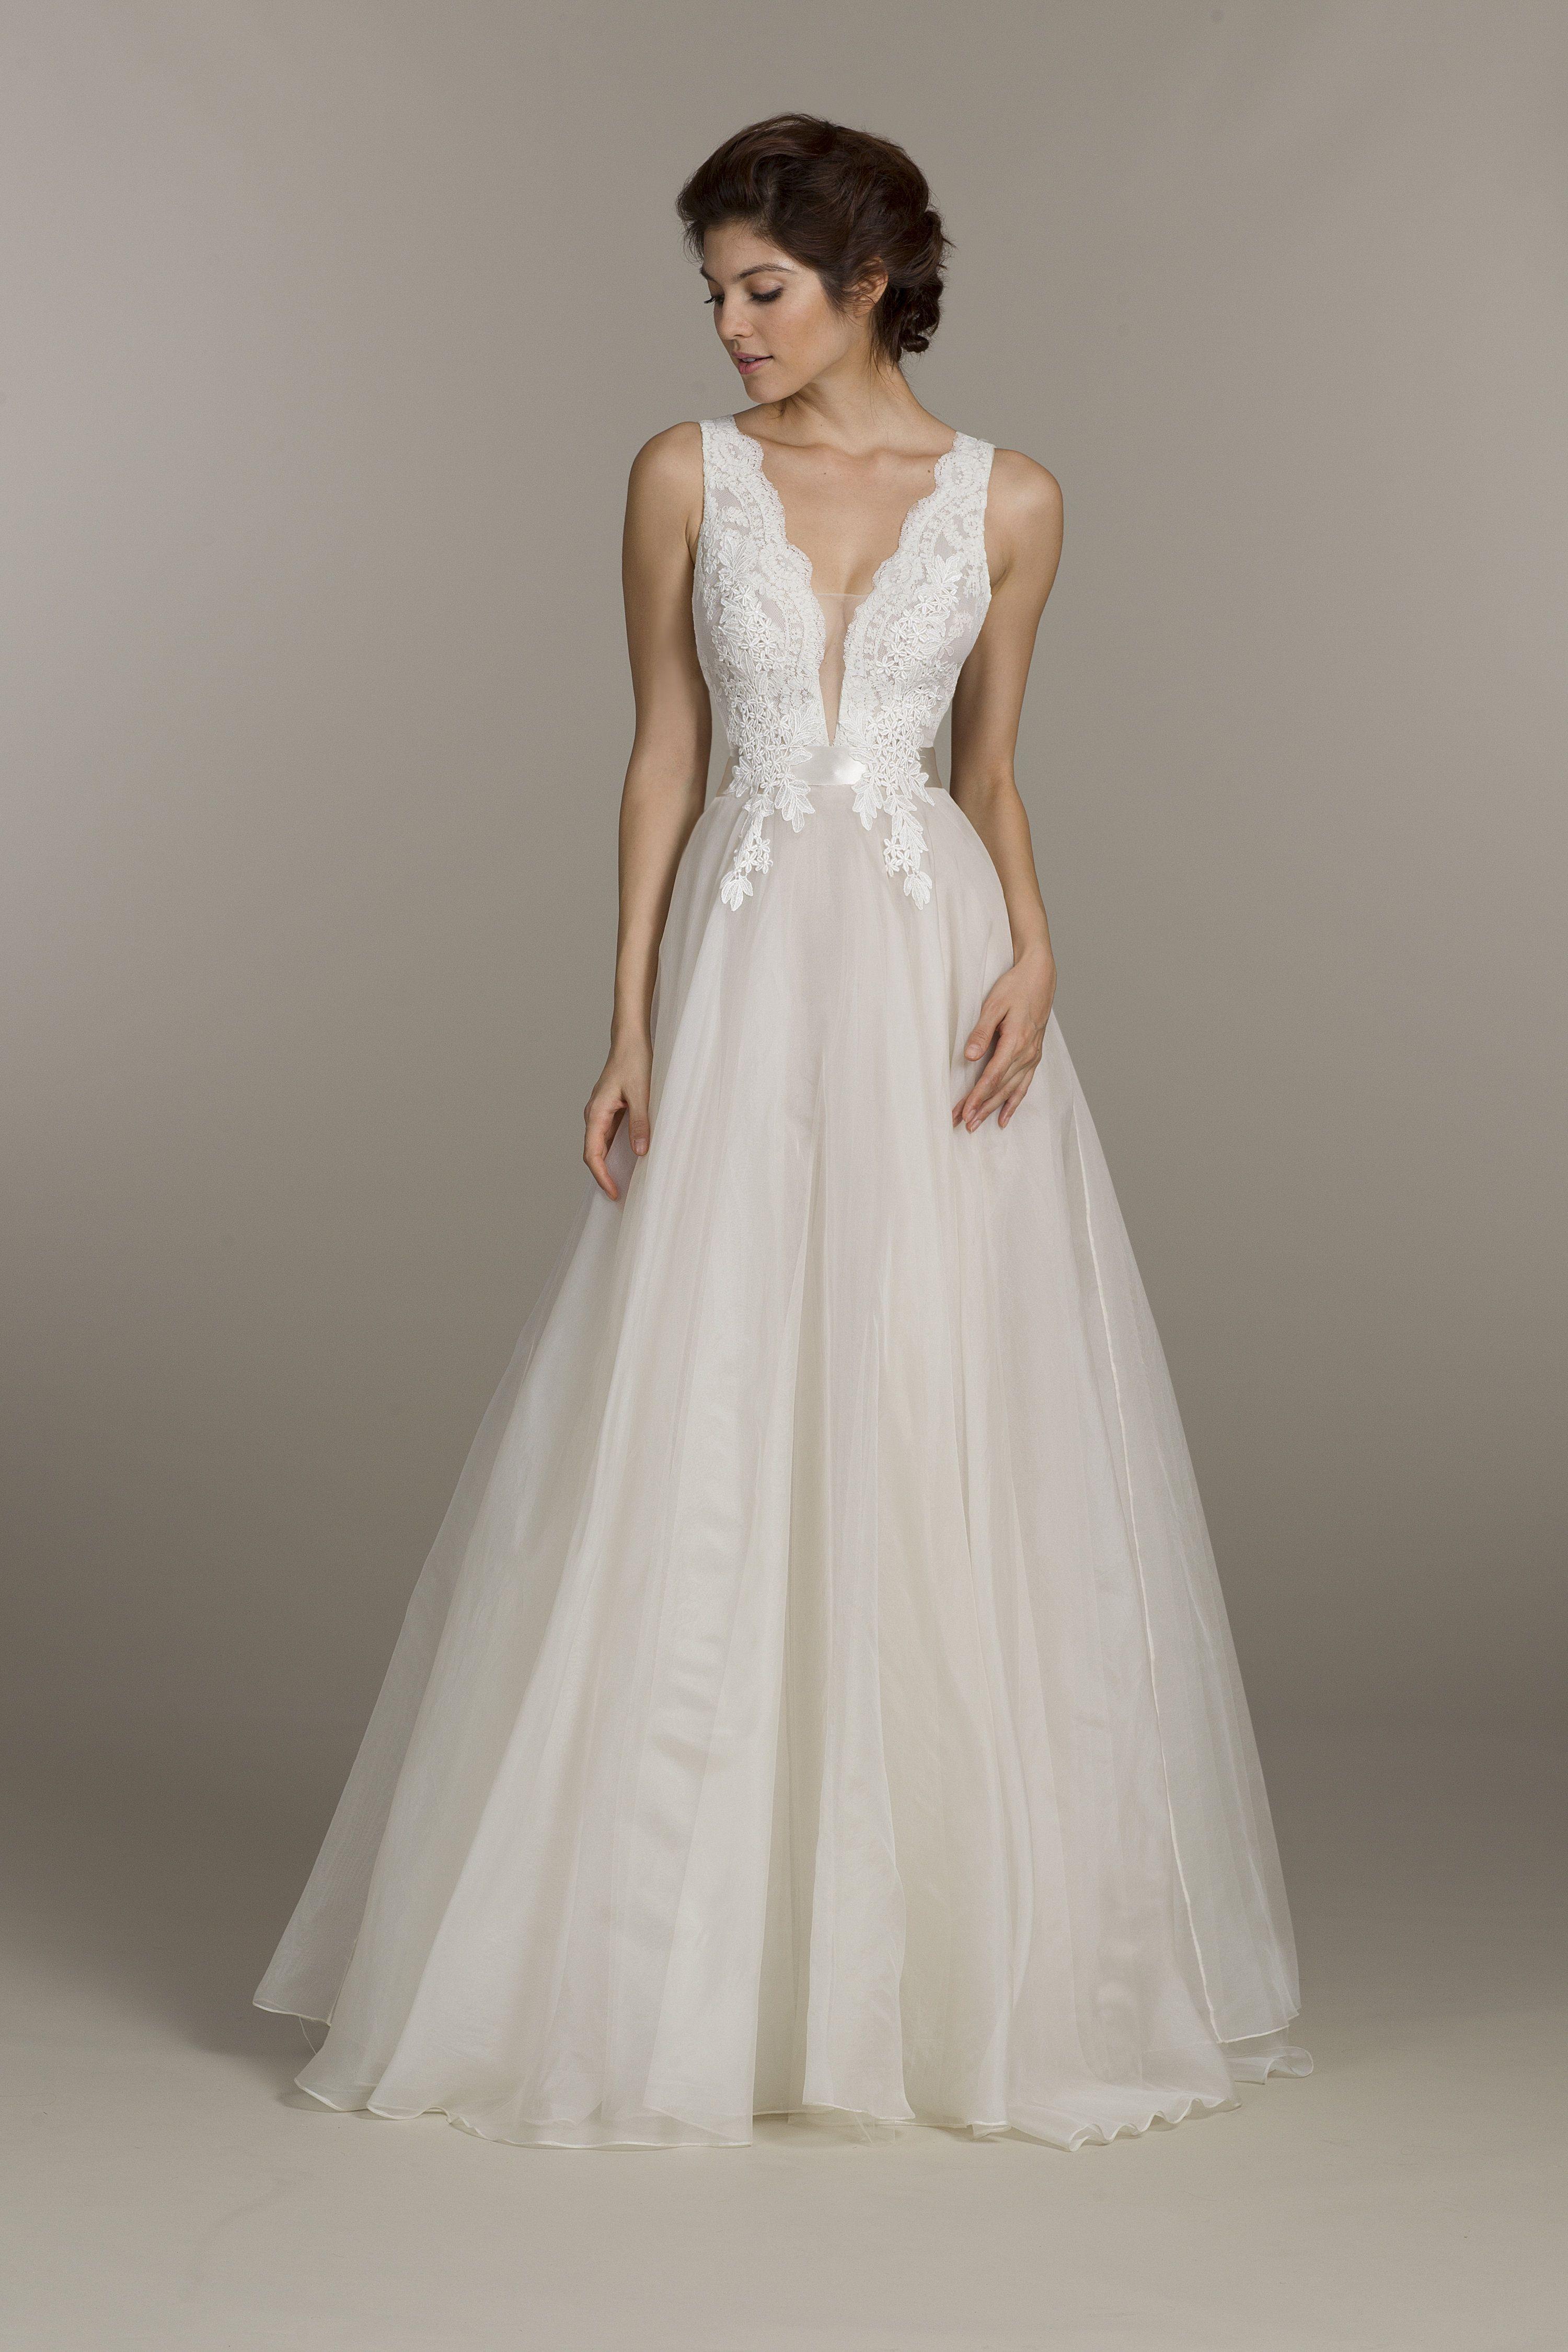 couture trouwjurk 2500 van het bruidsmode merk tara keely de van